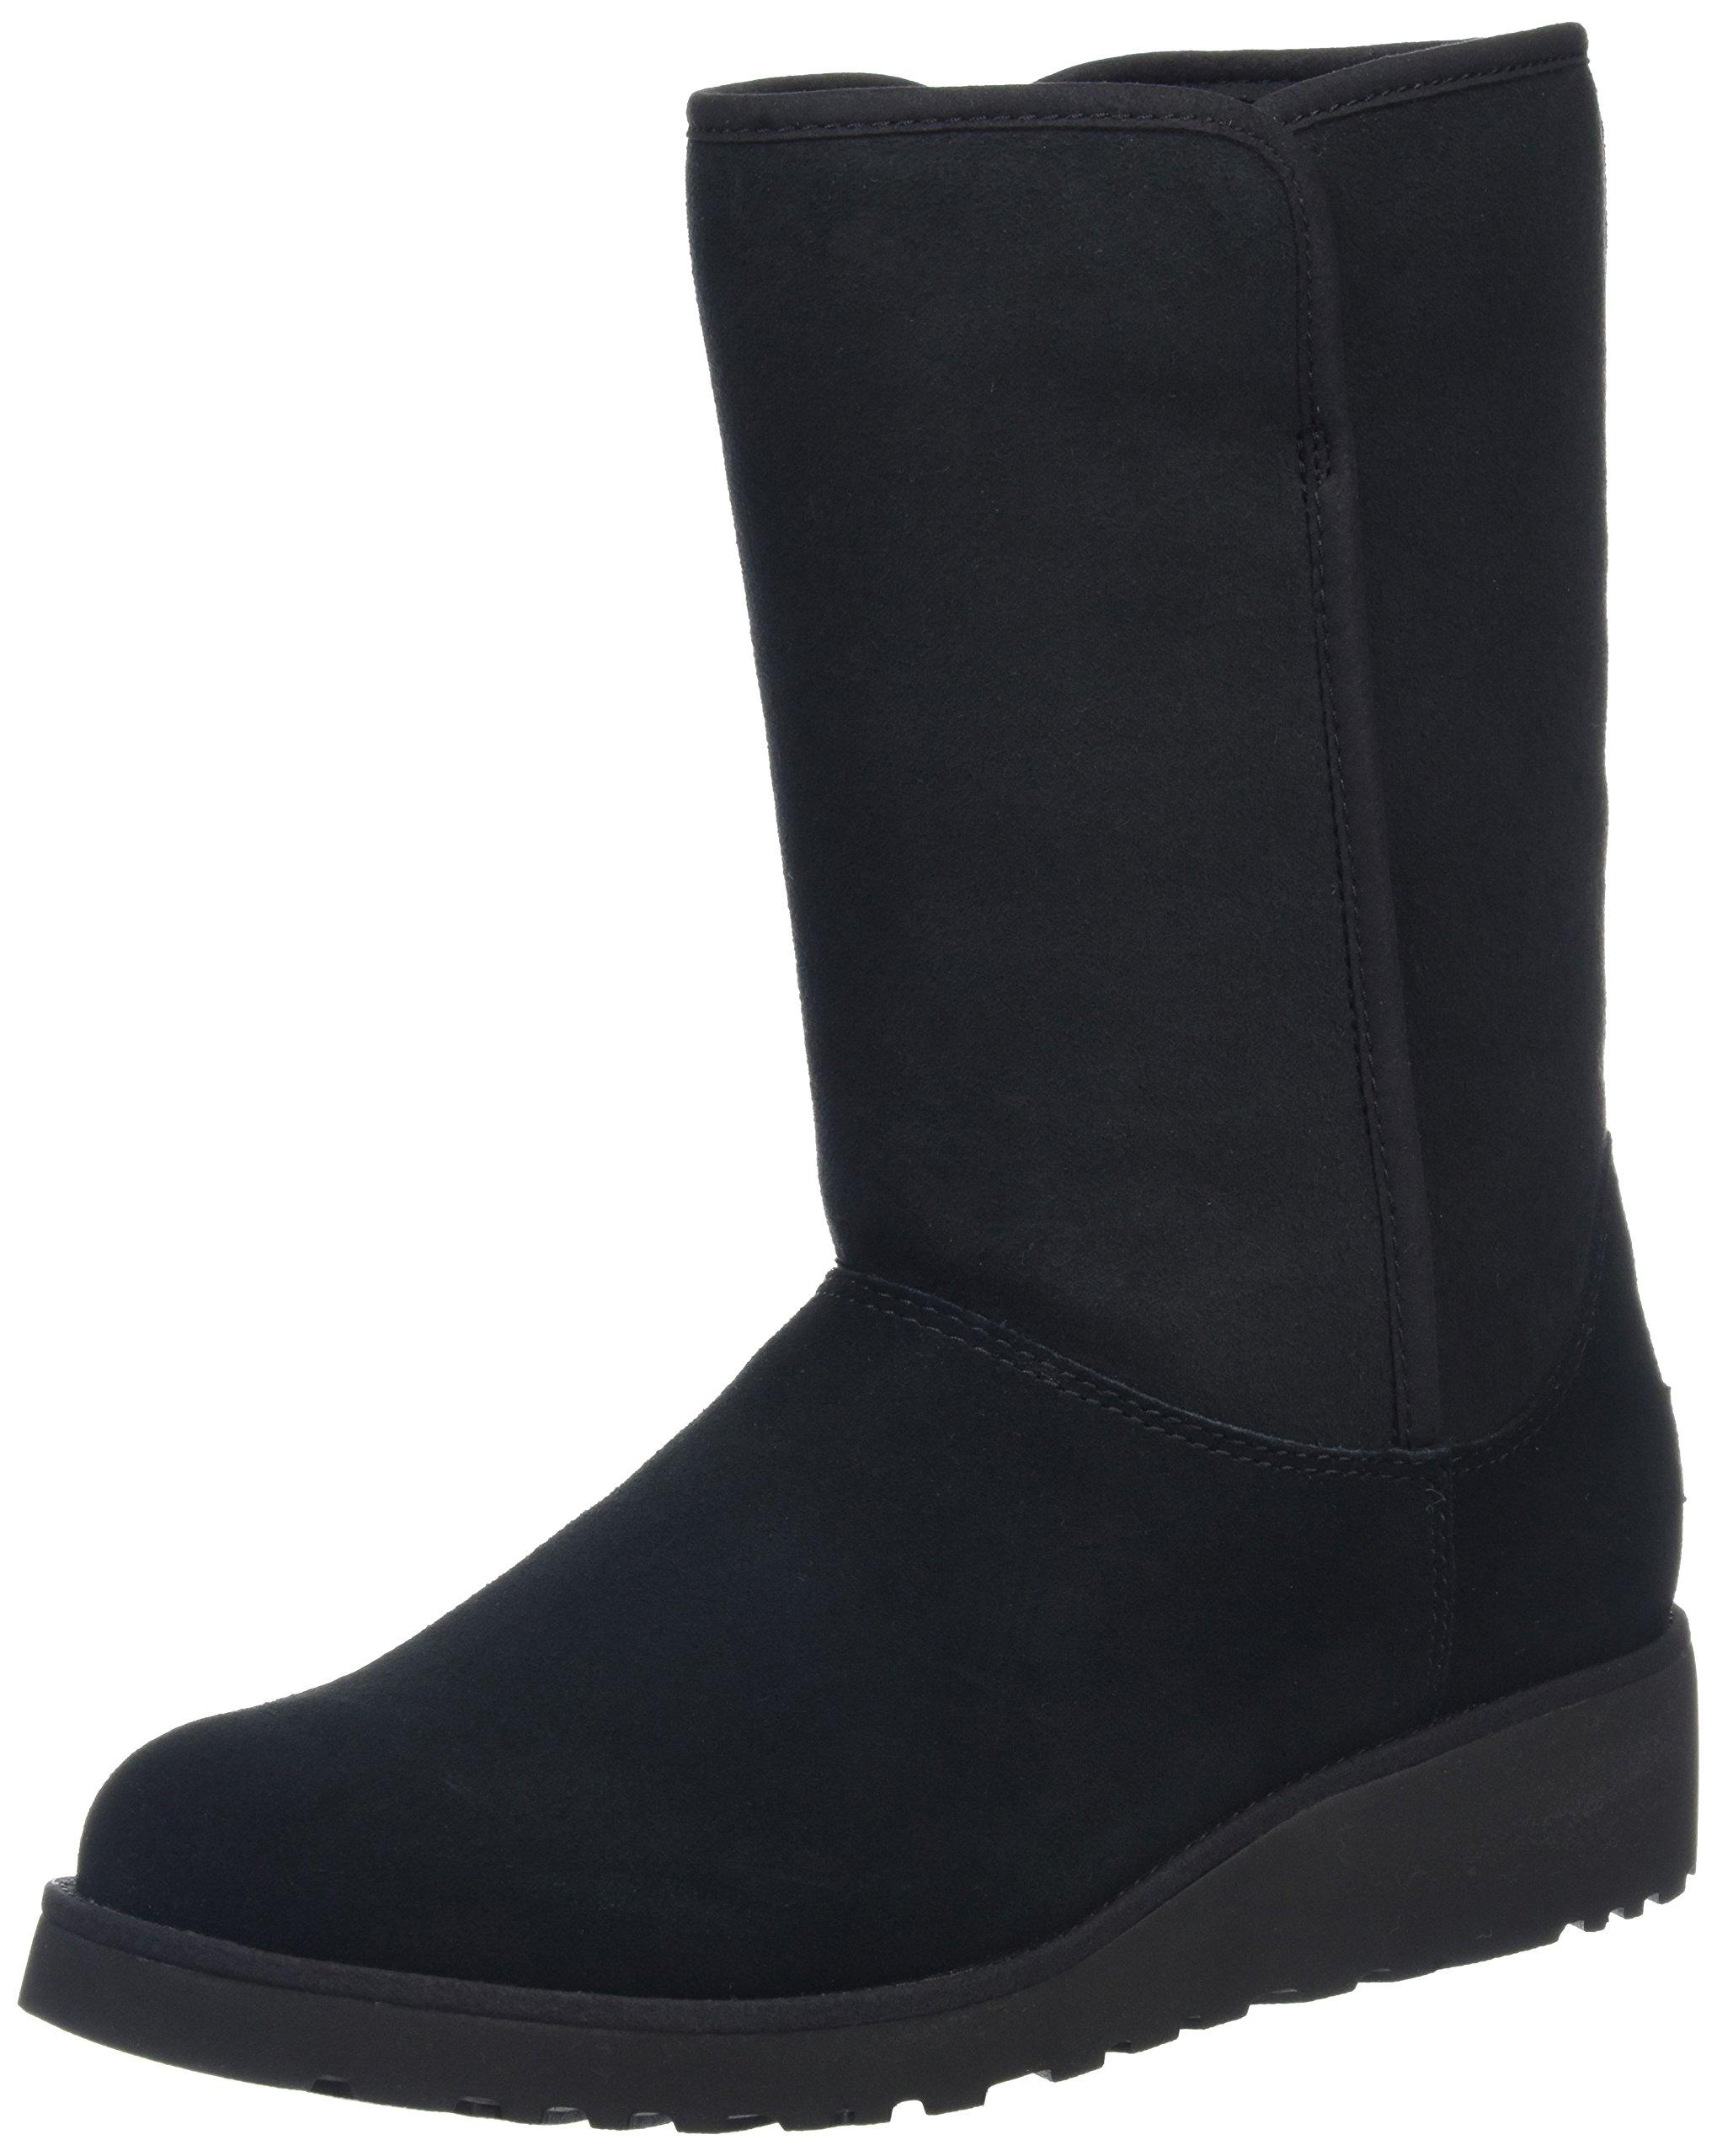 UGG Women's Amie Winter Boot, Black, 8.5 B US